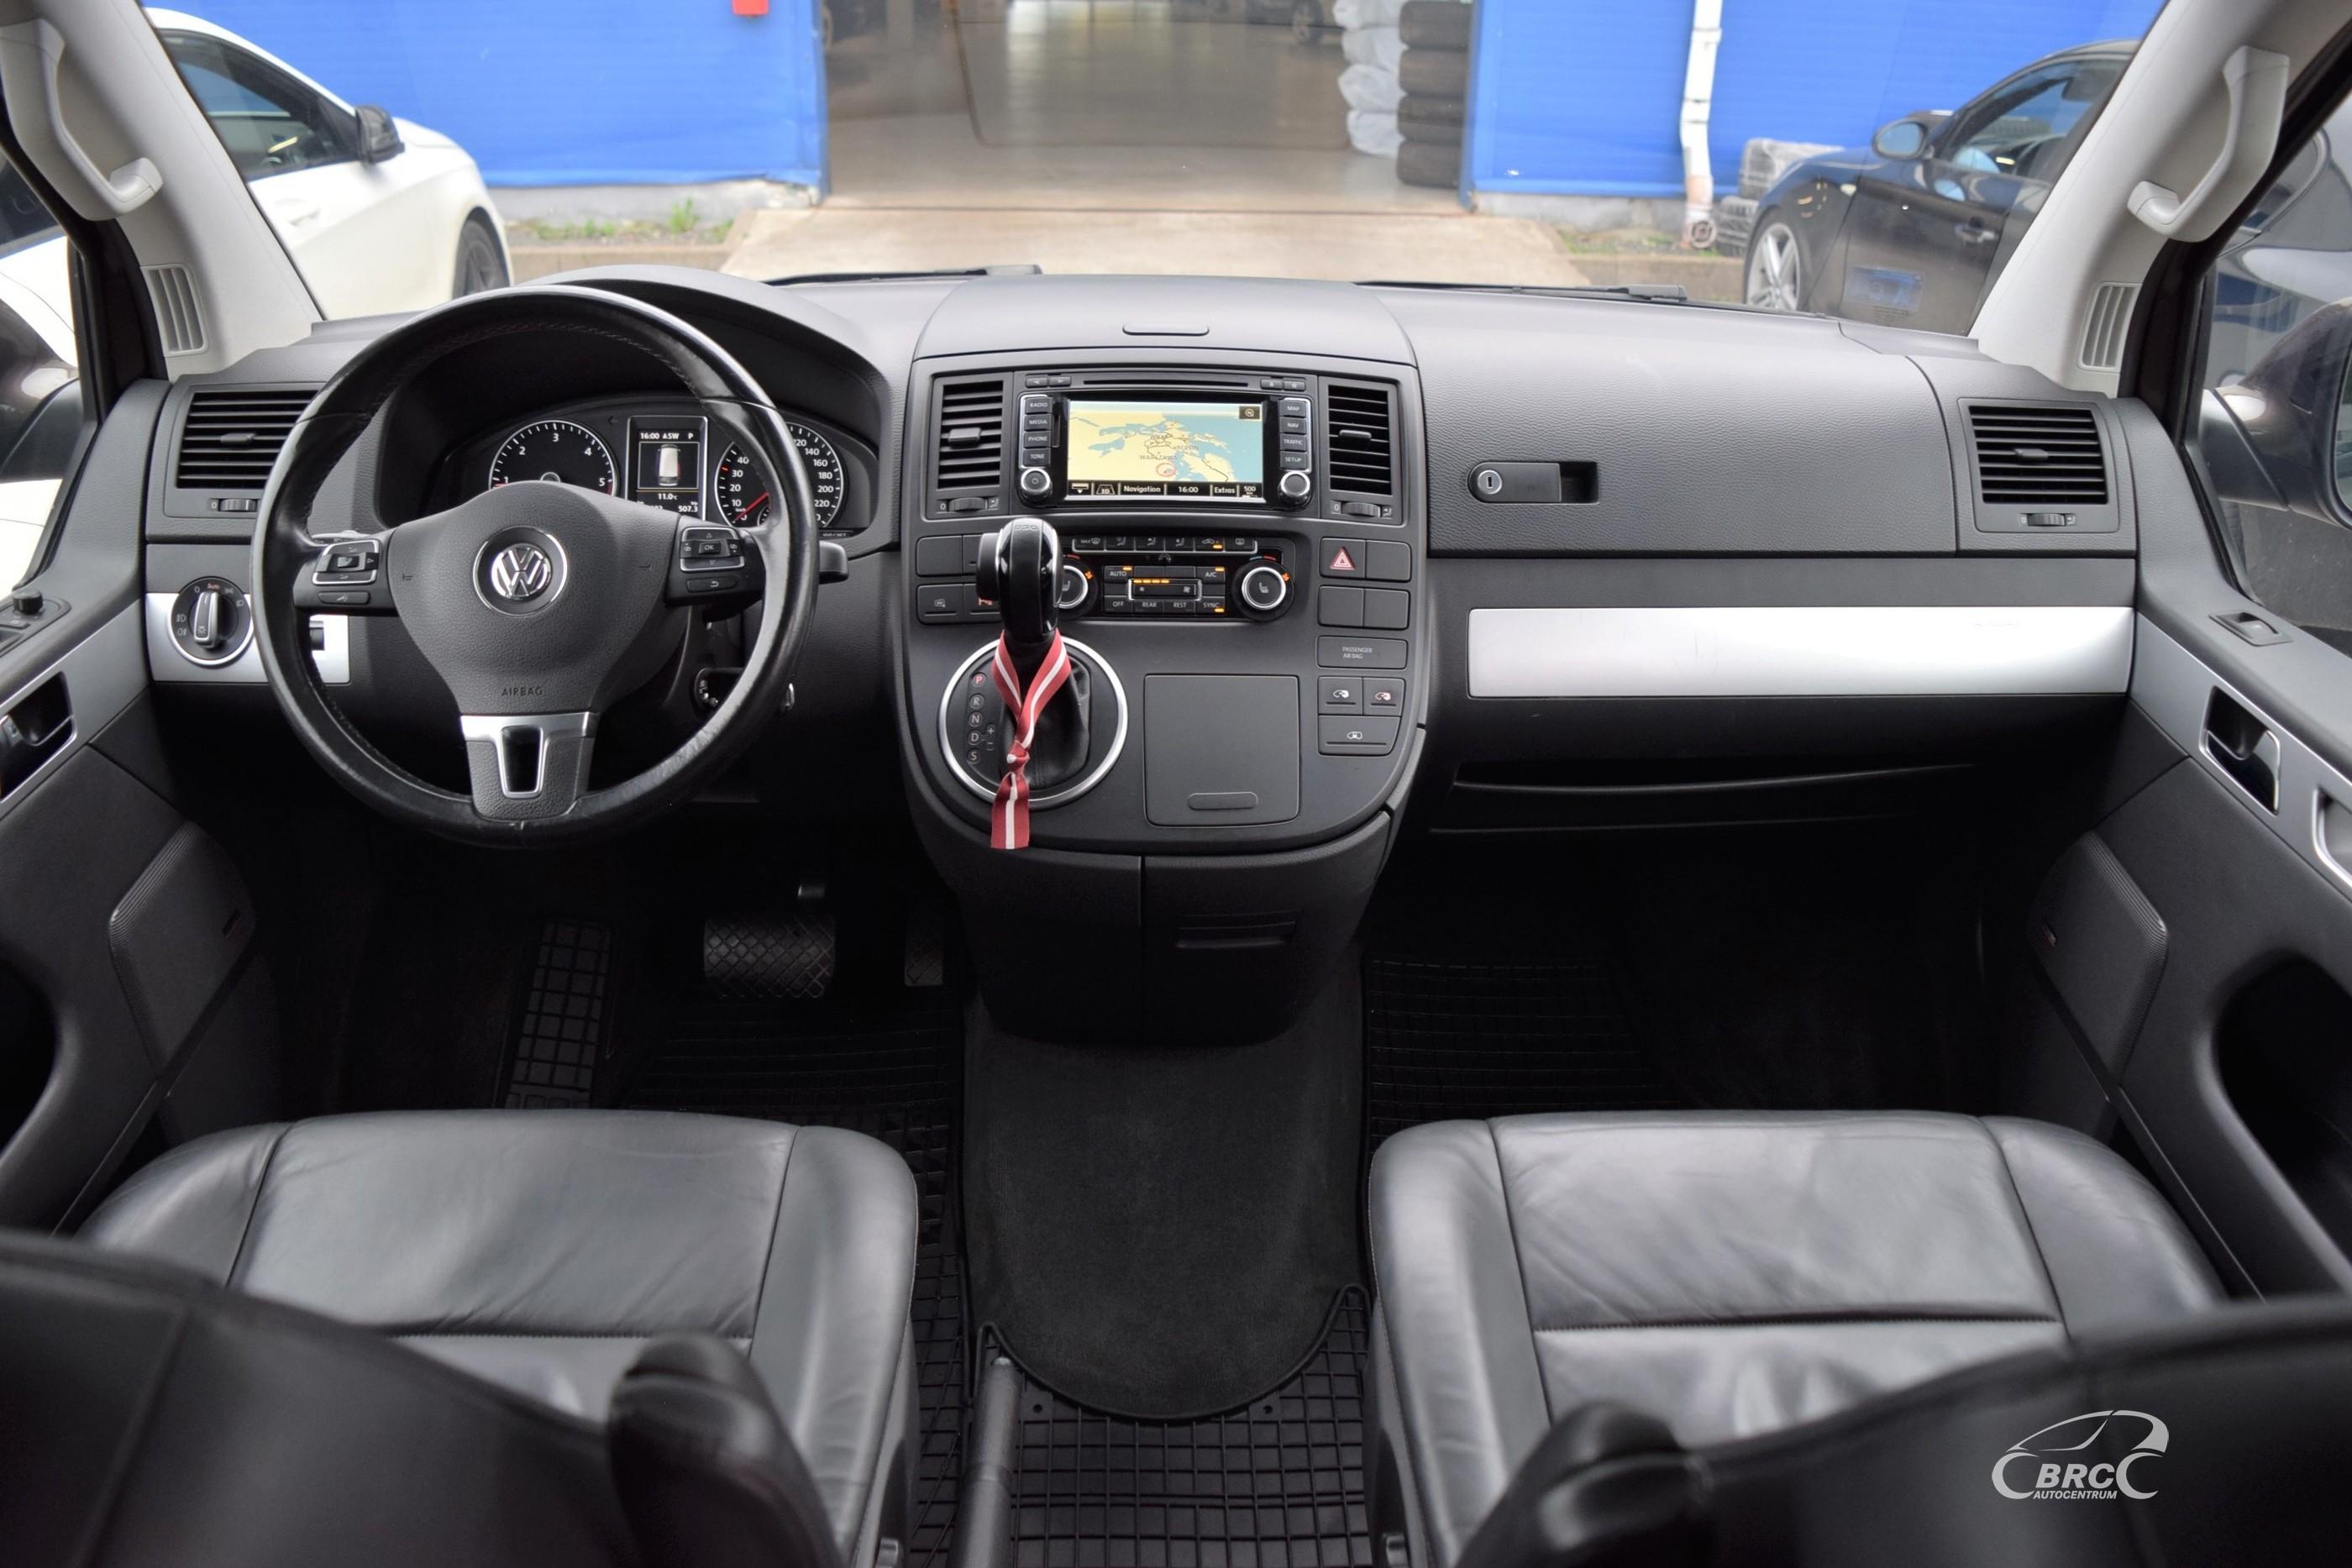 Volkswagen T5 Multivan Highline 4motion DSG 7 seats